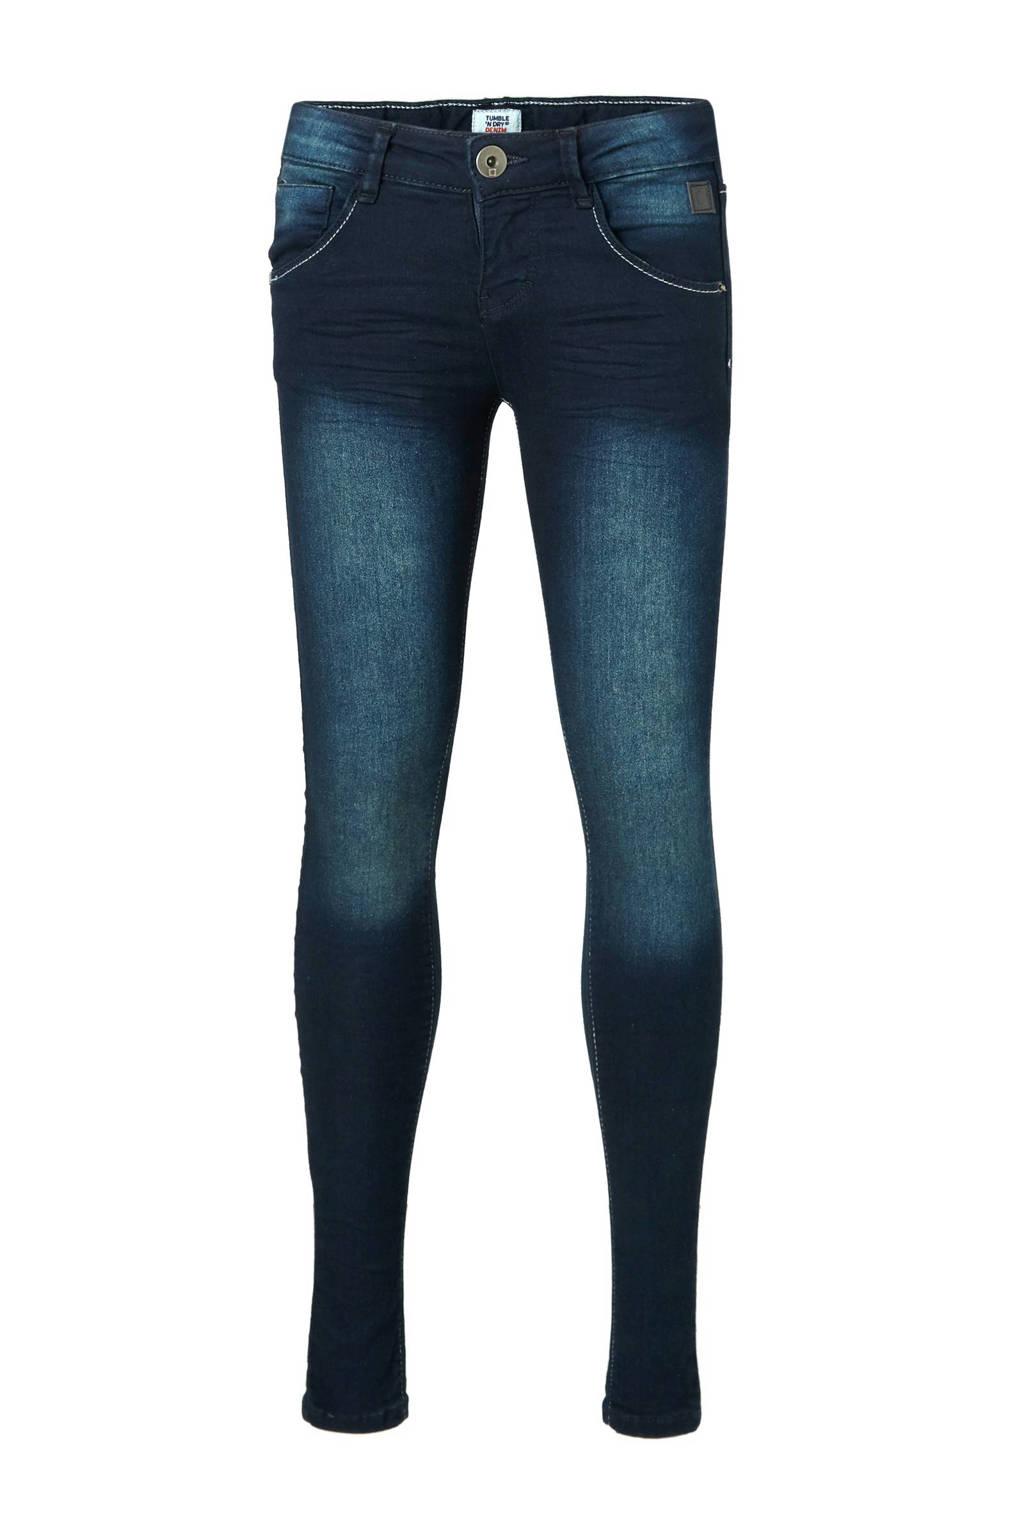 Tumble n dry Pearl extra skinny jeans, Denim medium used